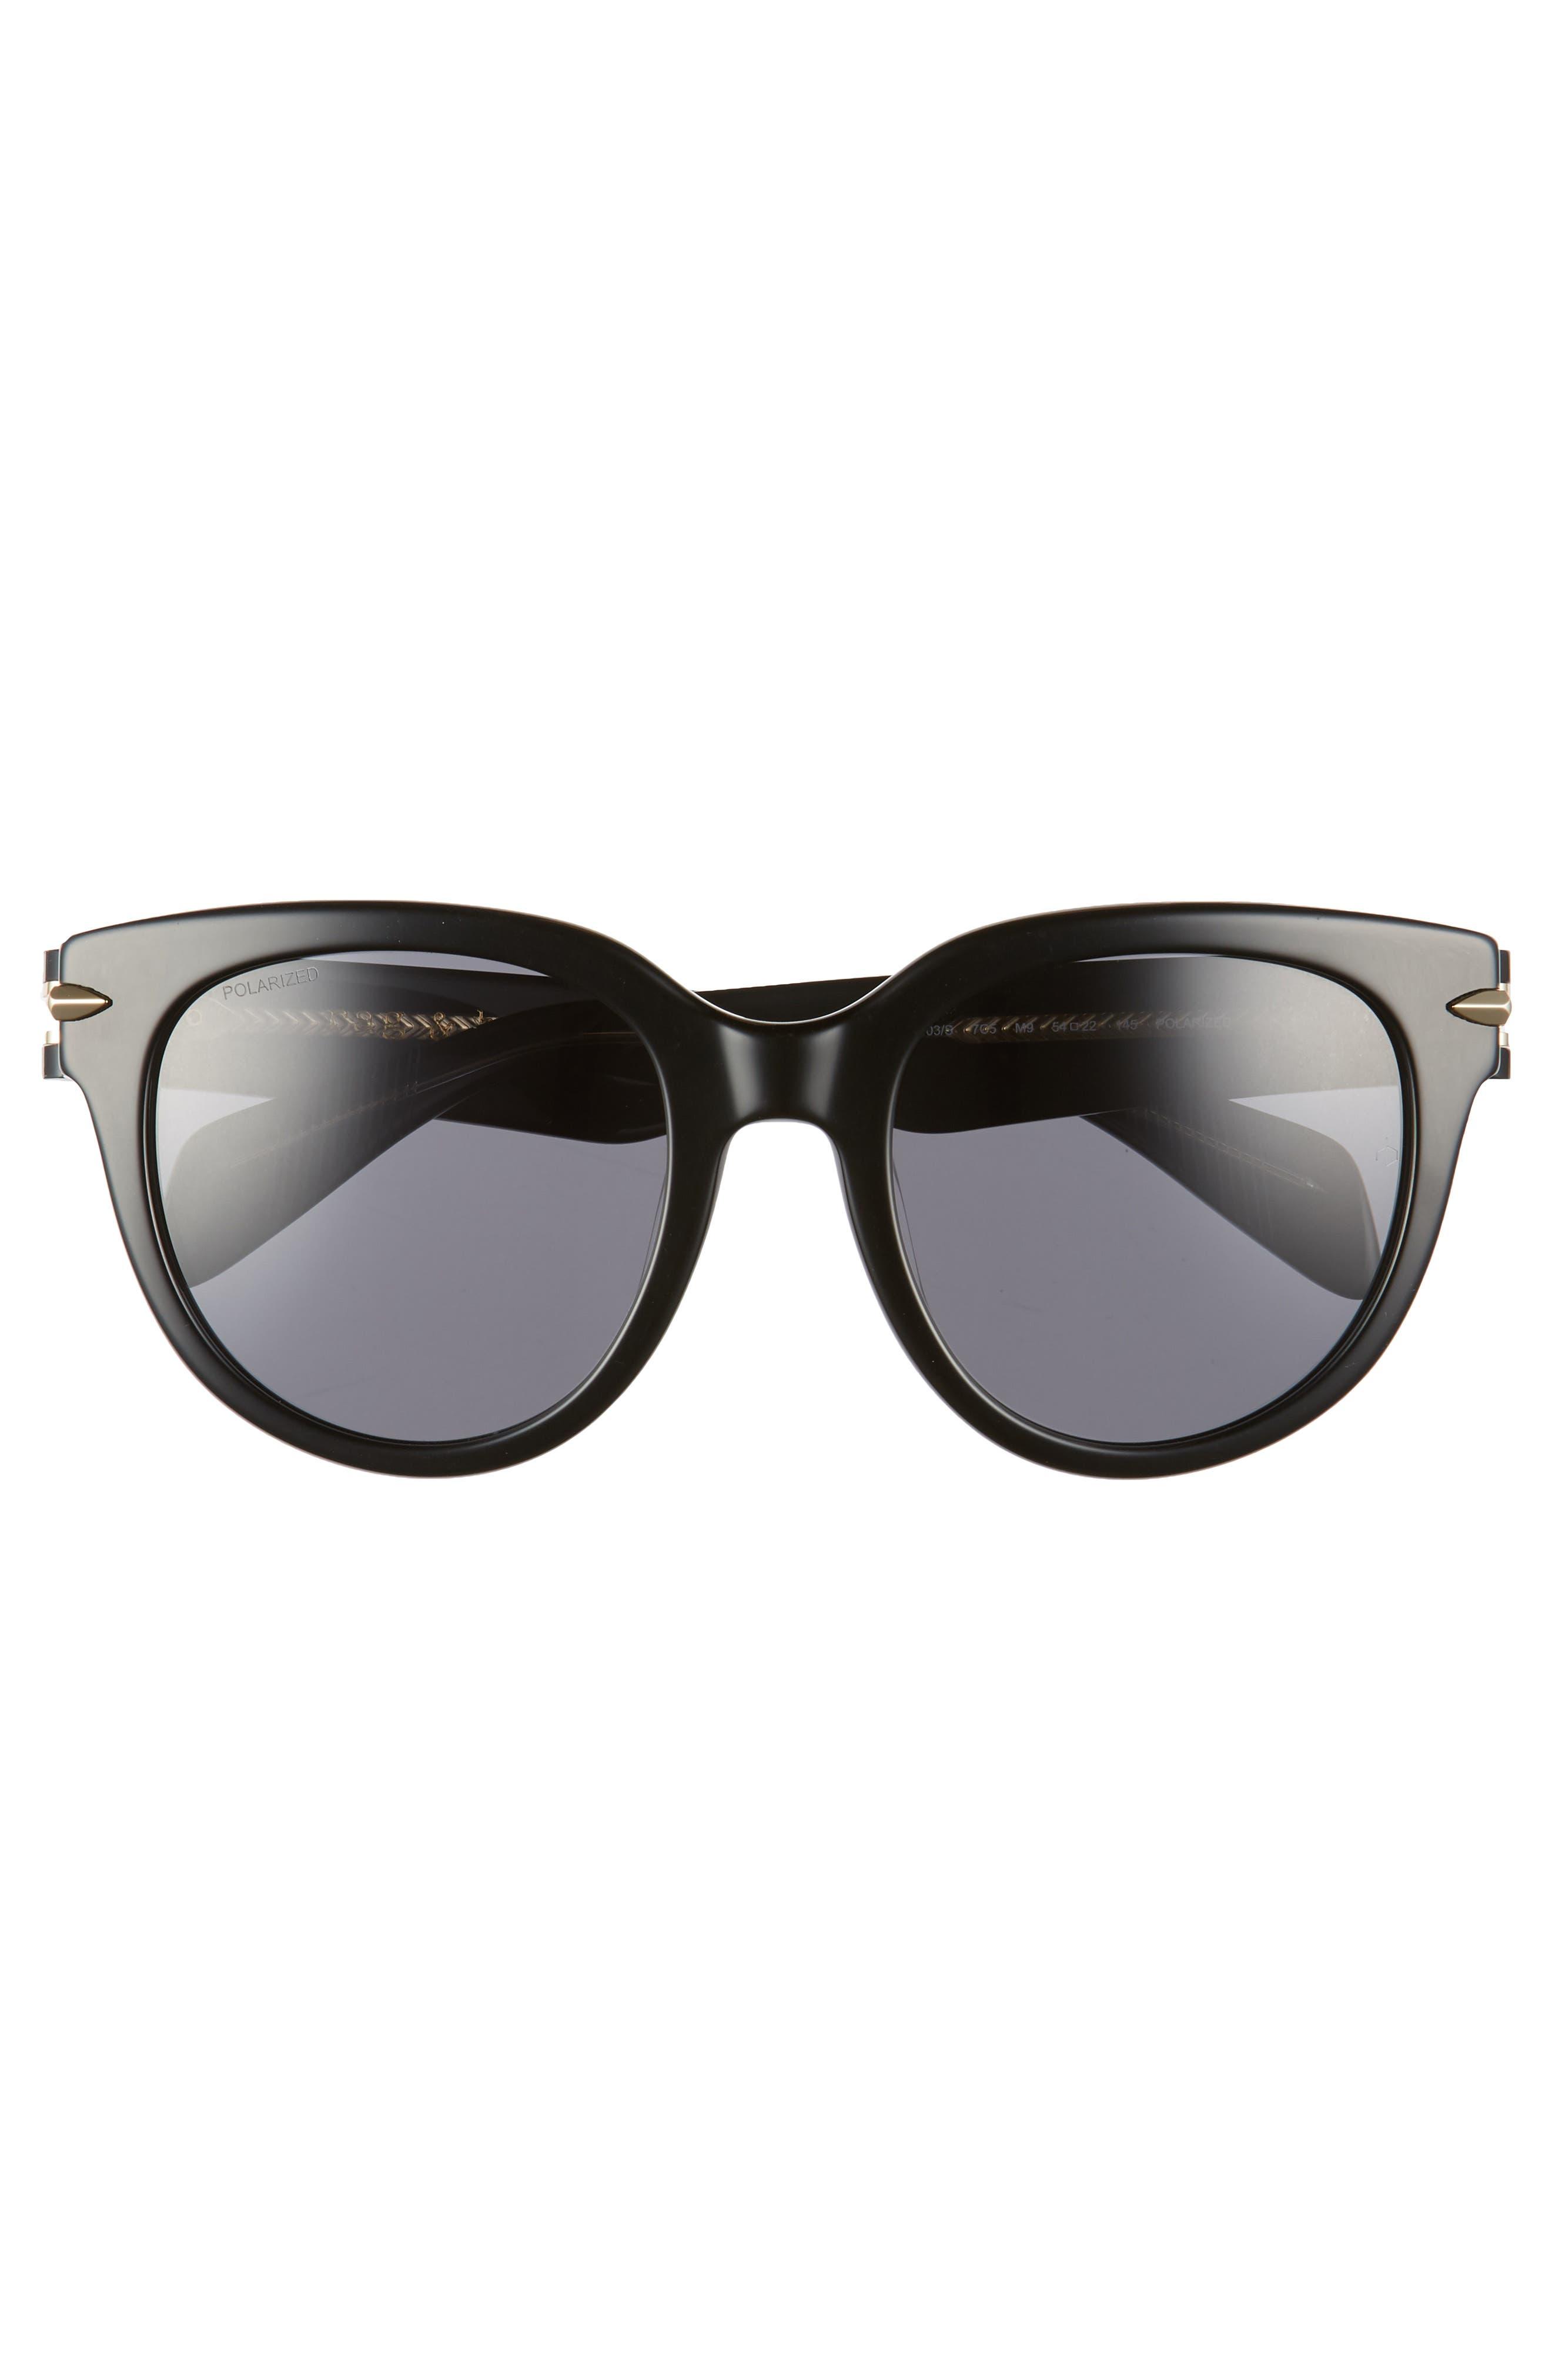 54mm Round Sunglasses,                             Alternate thumbnail 3, color,                             BLACK/ CRYSTAL